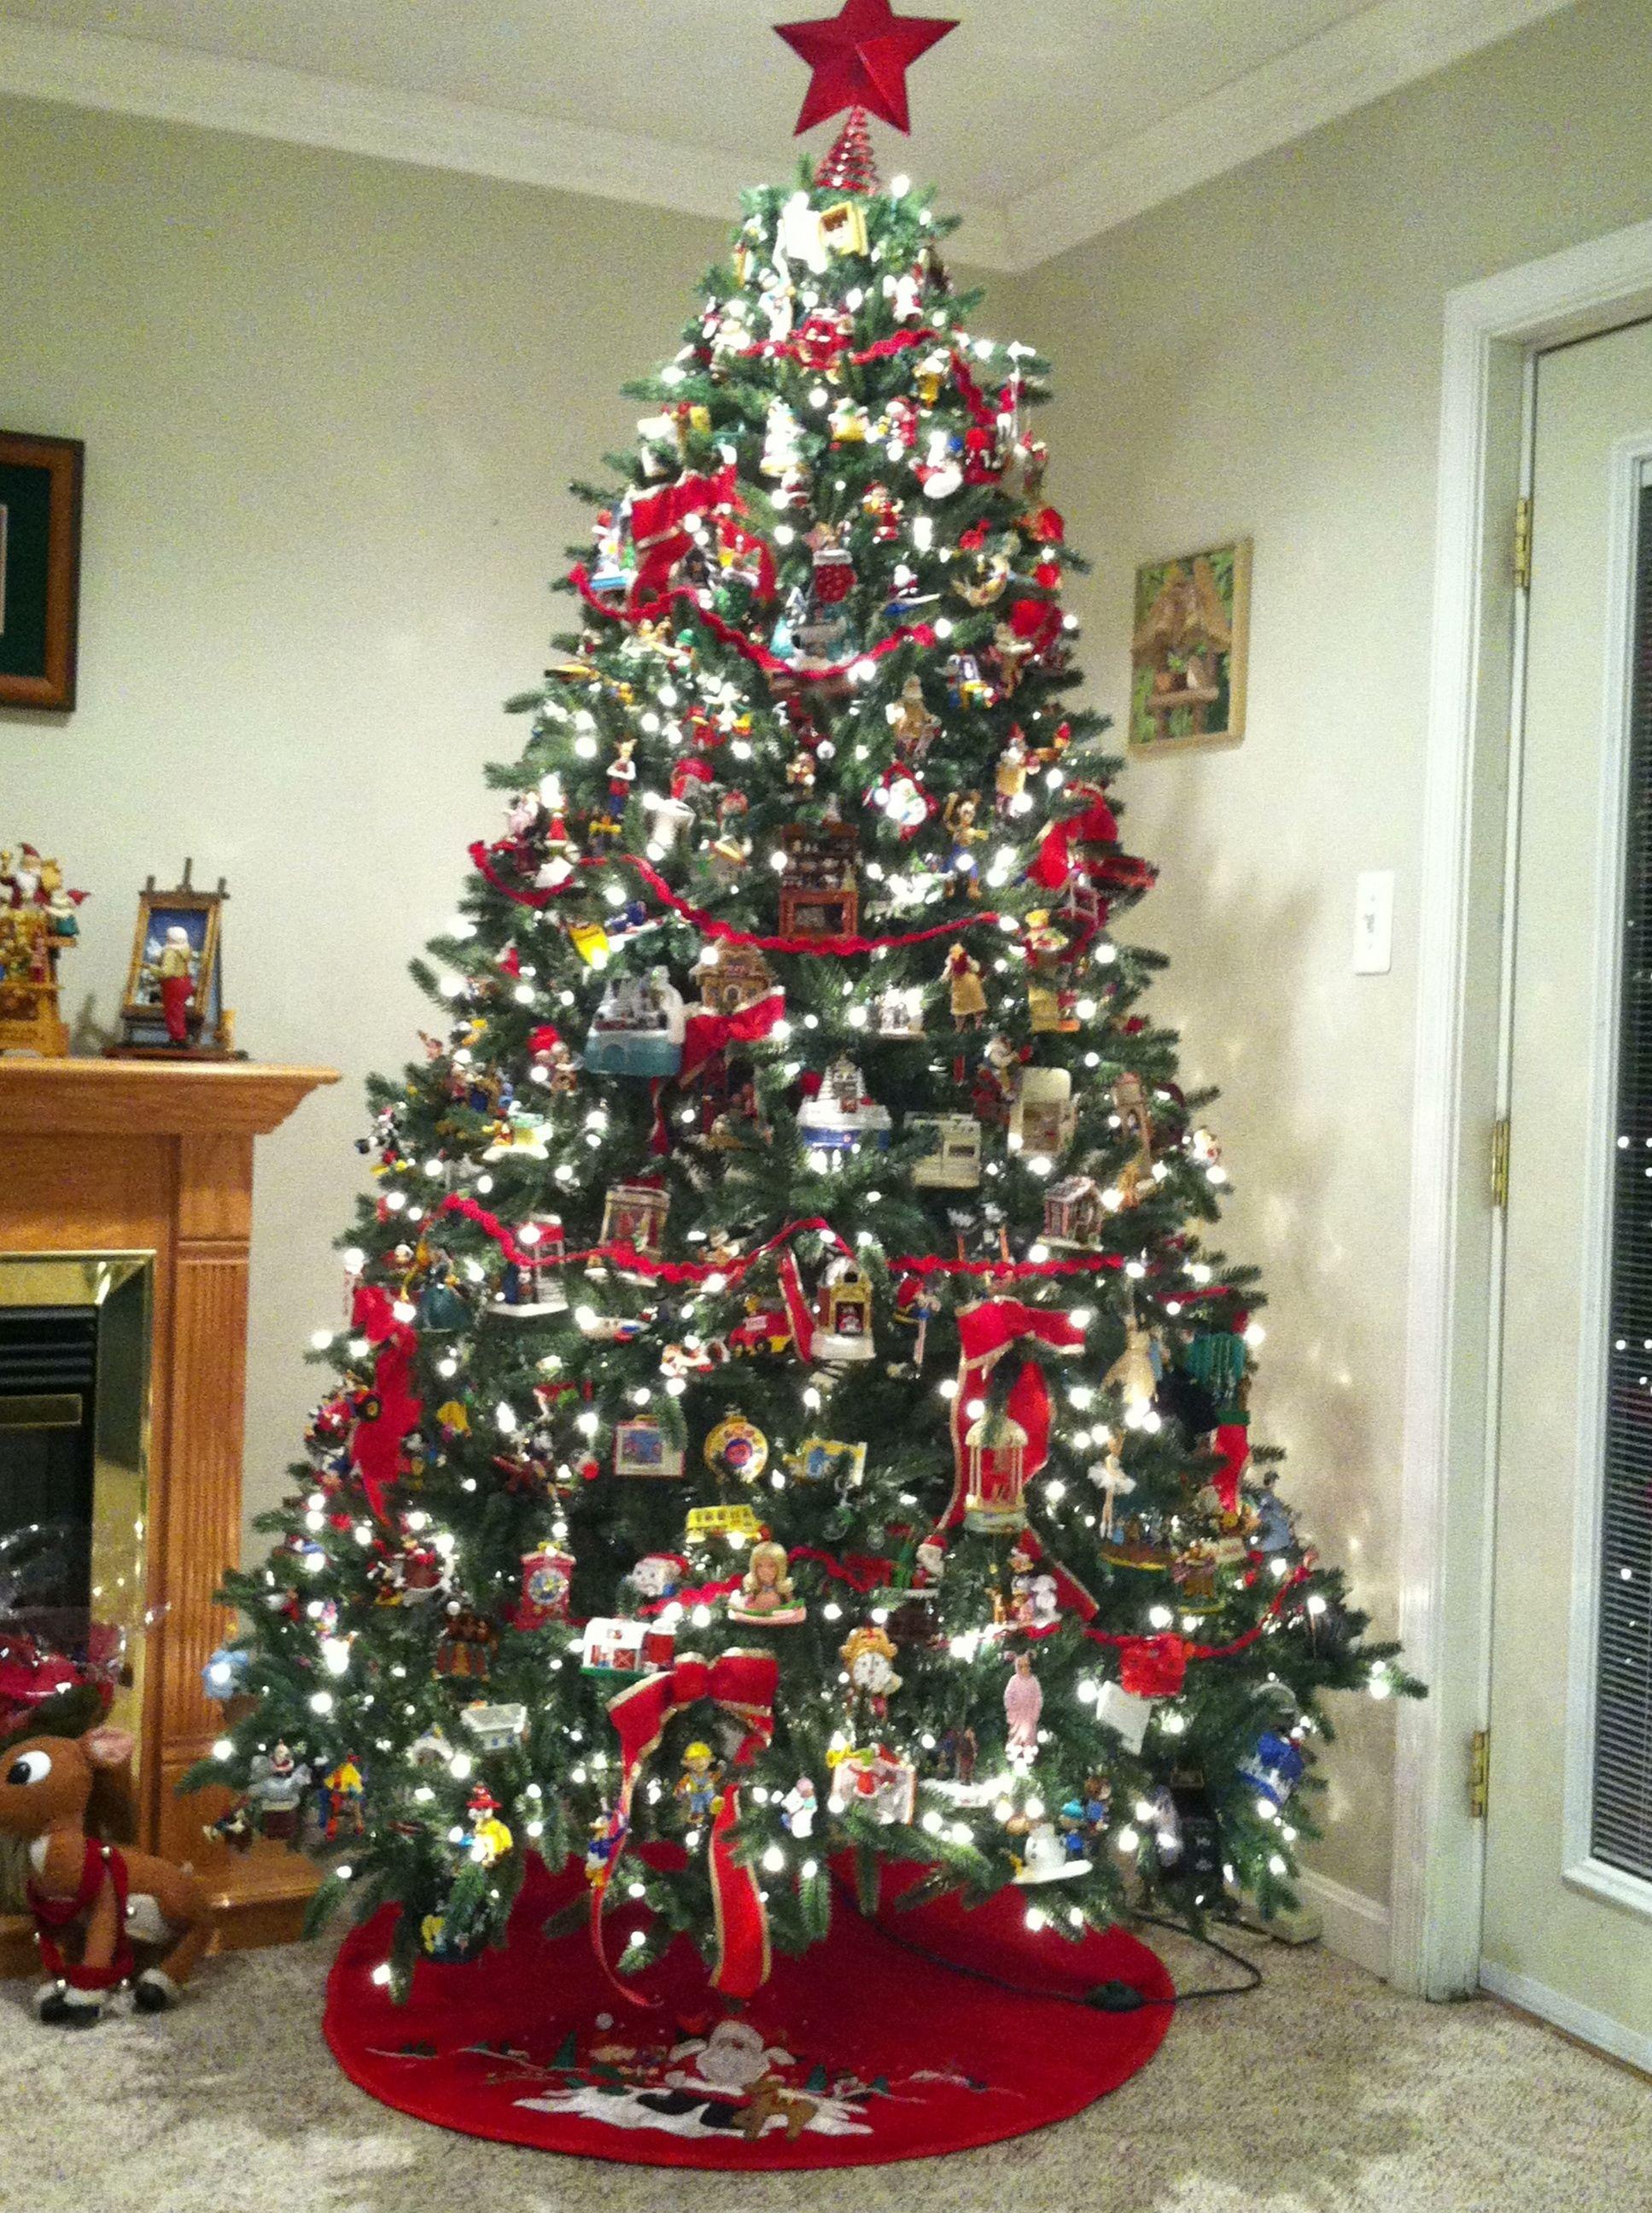 Hallmark Christmas Tree. My mom's Christmas tree. The most ...